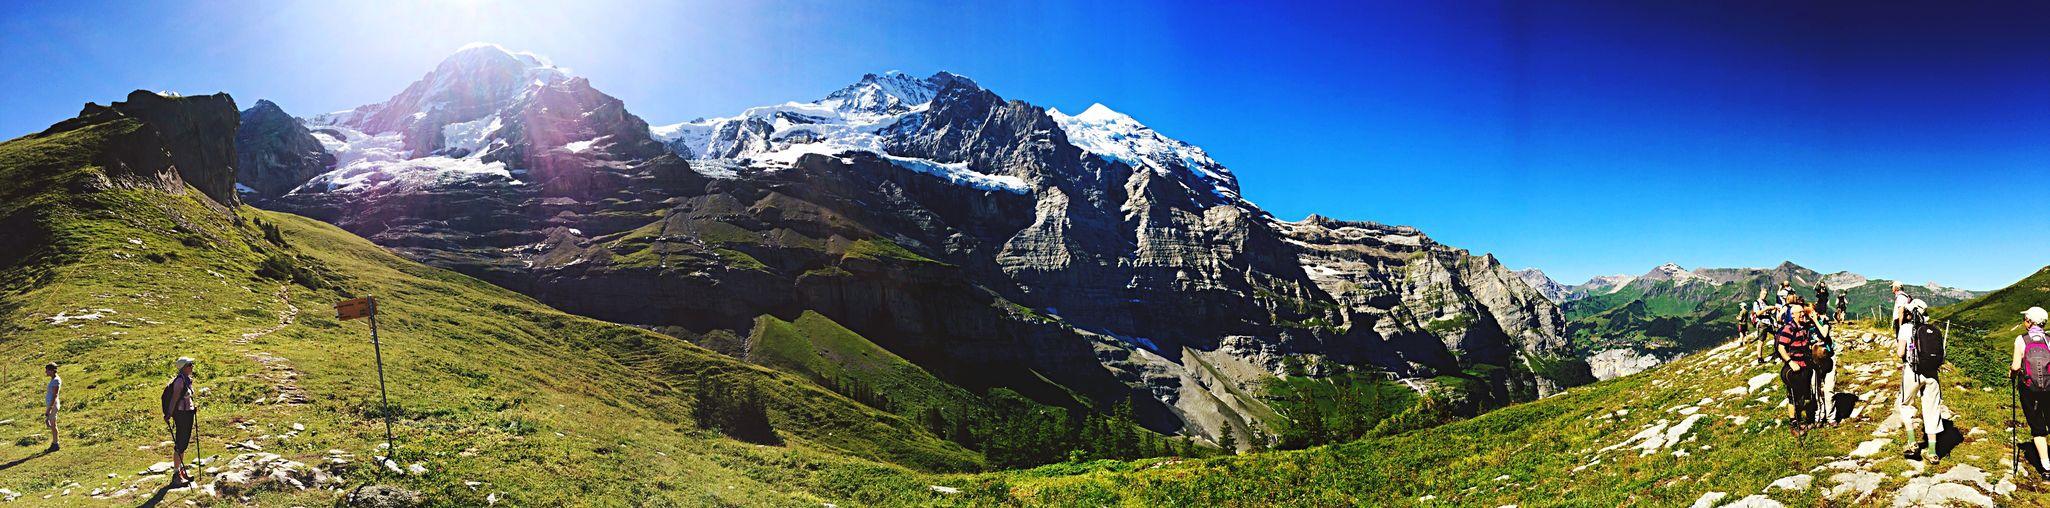 Taken with my phone... Kleine Shidegg Switzerland Switzerland Canonphotography Mountains Walking Sunnyday Nature Takenwithaniphone